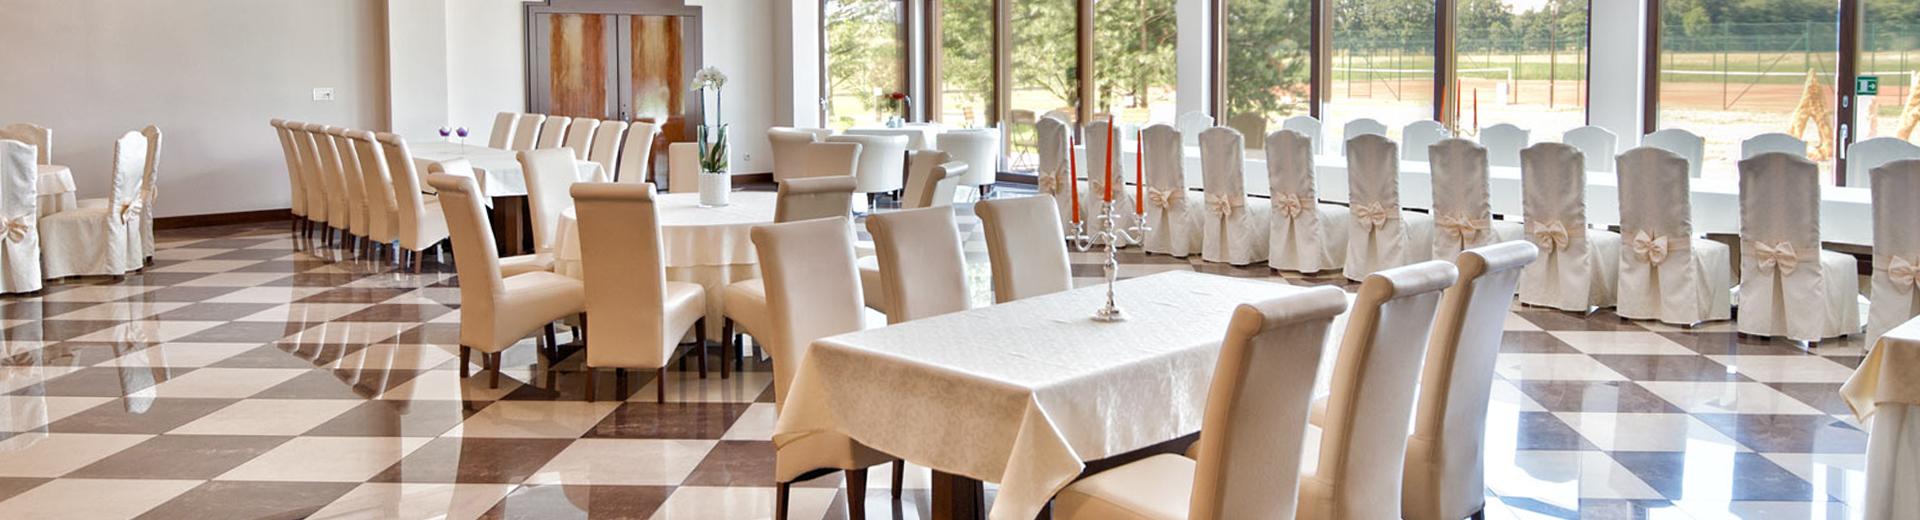 sala-restauracyjna-olesno